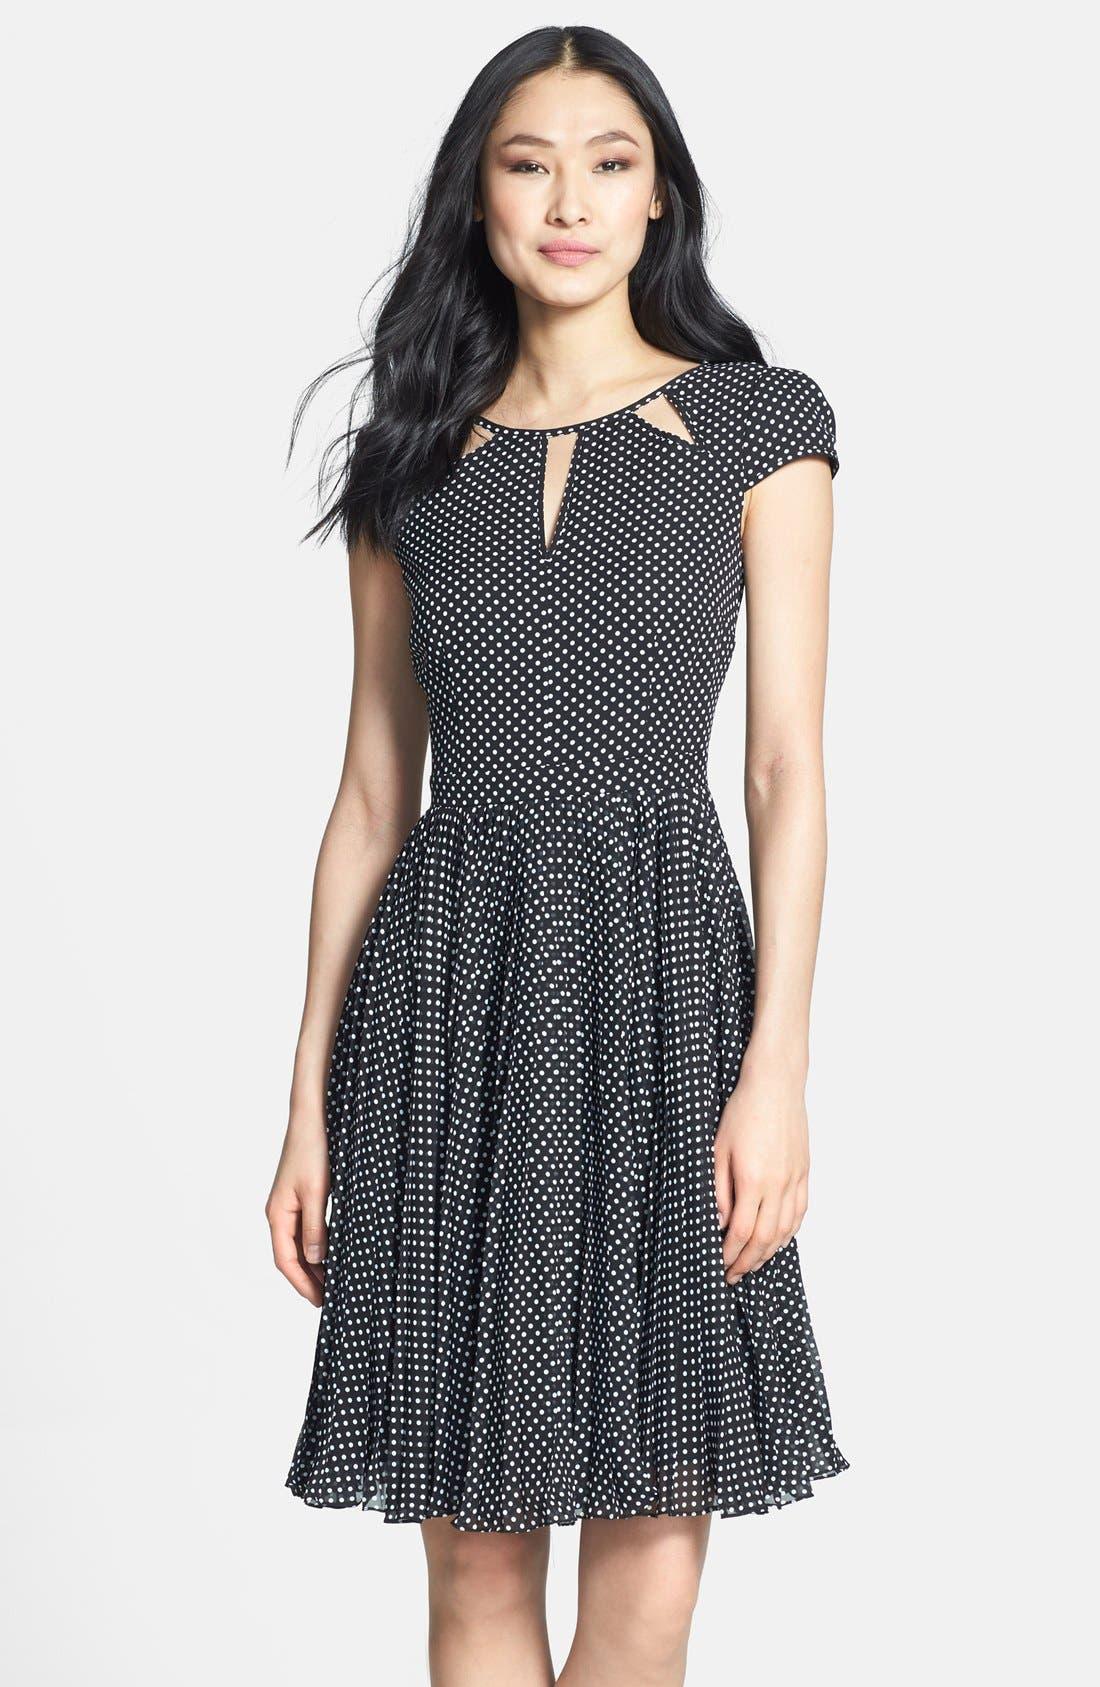 Alternate Image 1 Selected - Adrianna Papell Polka Dot Cutout Fit & Flare Dress (Regular & Petite)